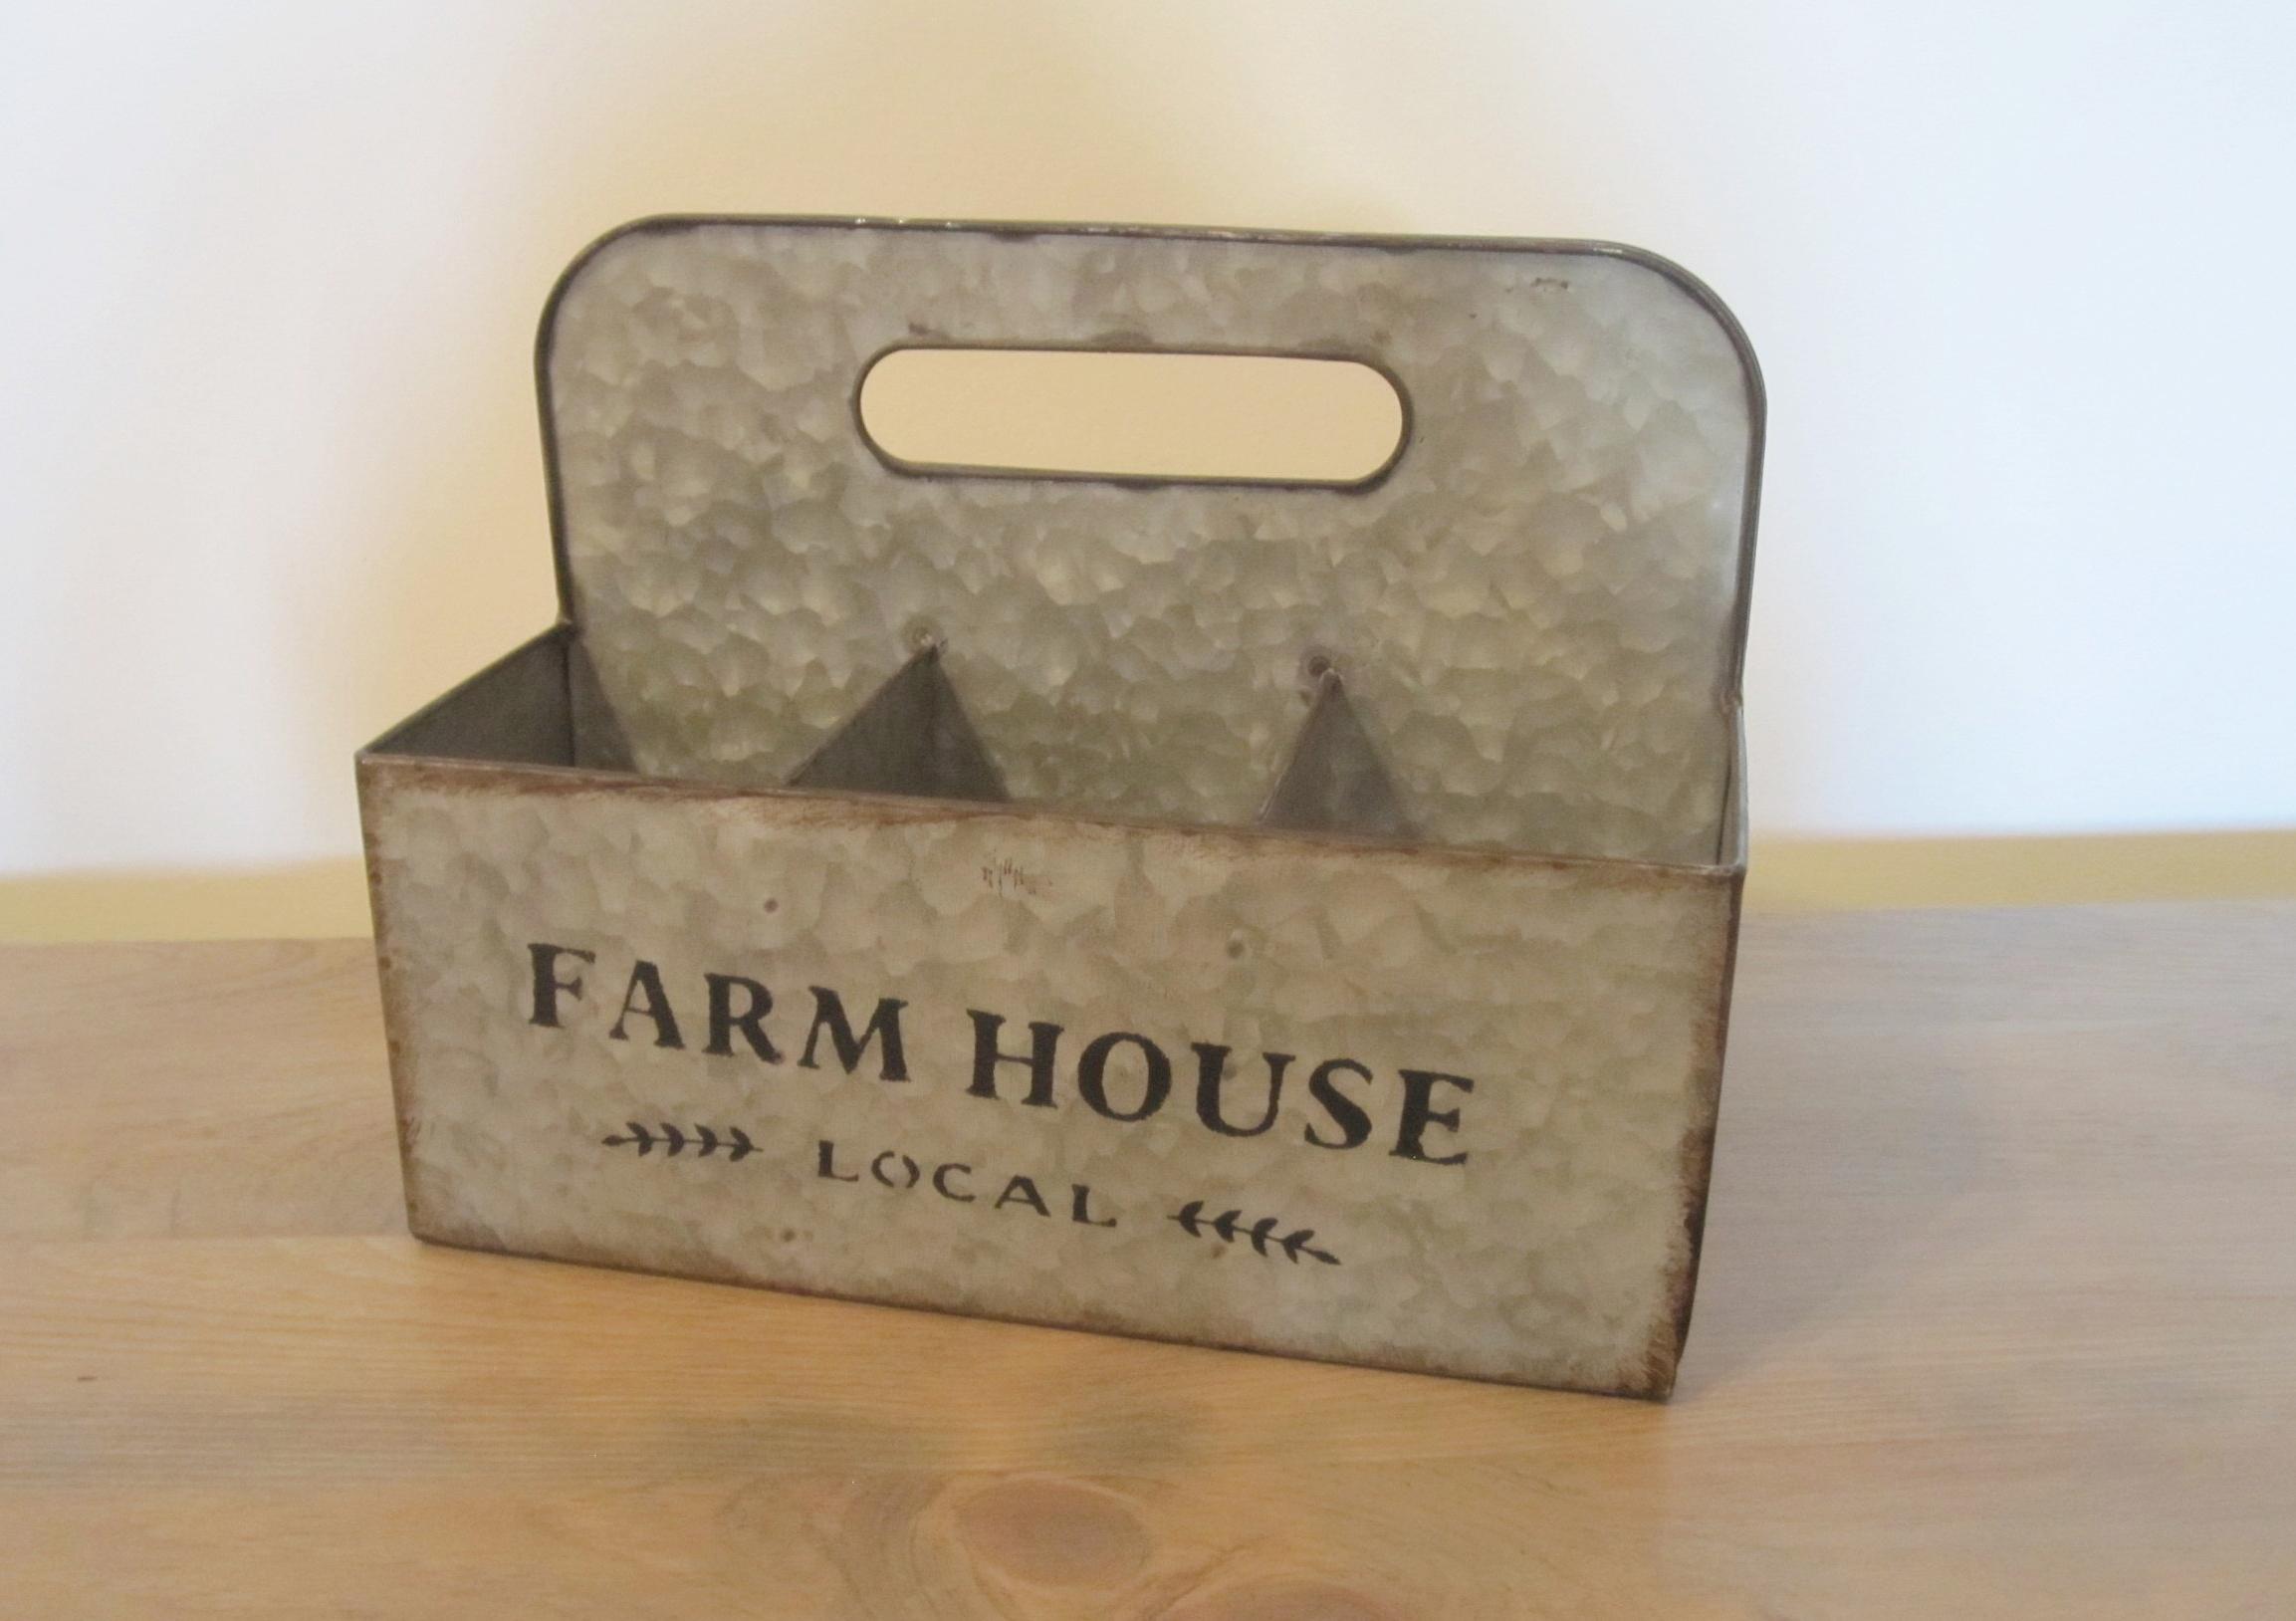 Farmhouse Tote - Description ~ 6 compartment tote; use for napkins, flatware, flowers....Quantity ~2Rental Price ~ $6